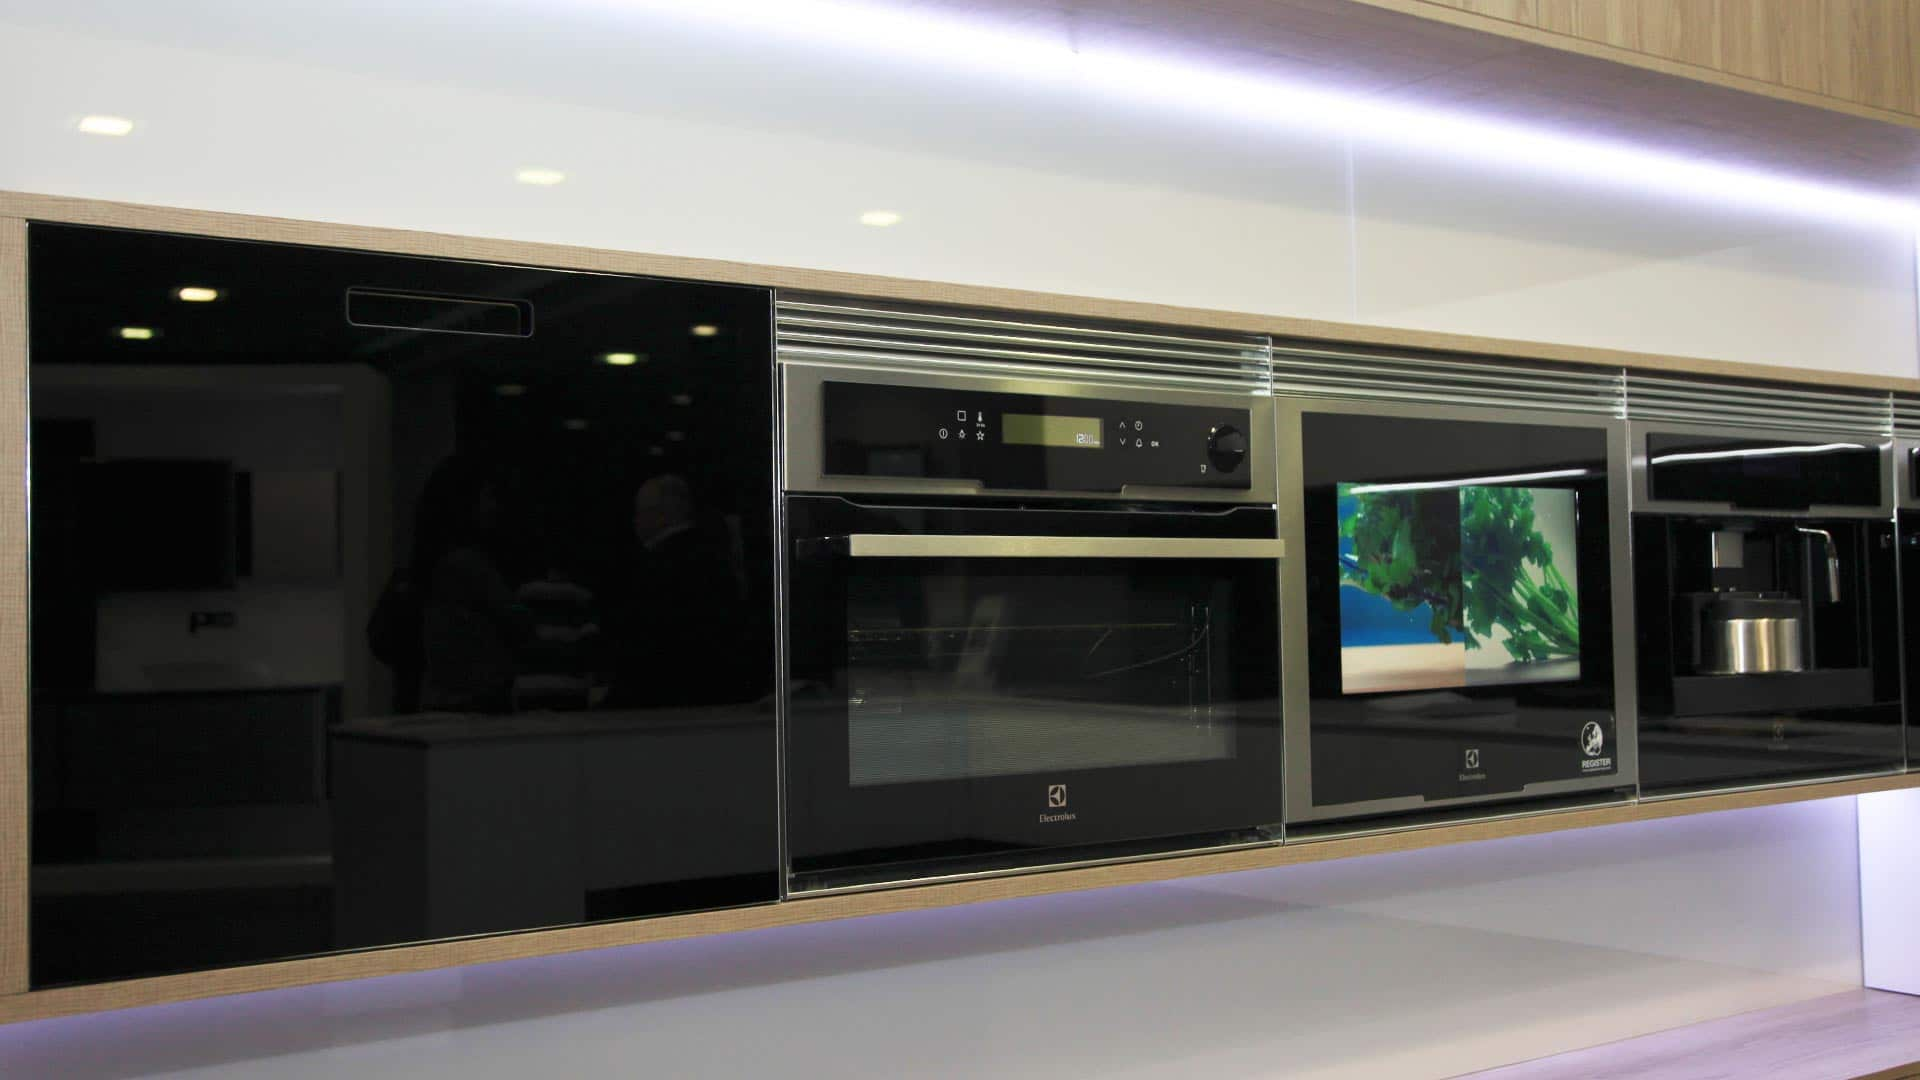 Cocina Kitchen in Poio